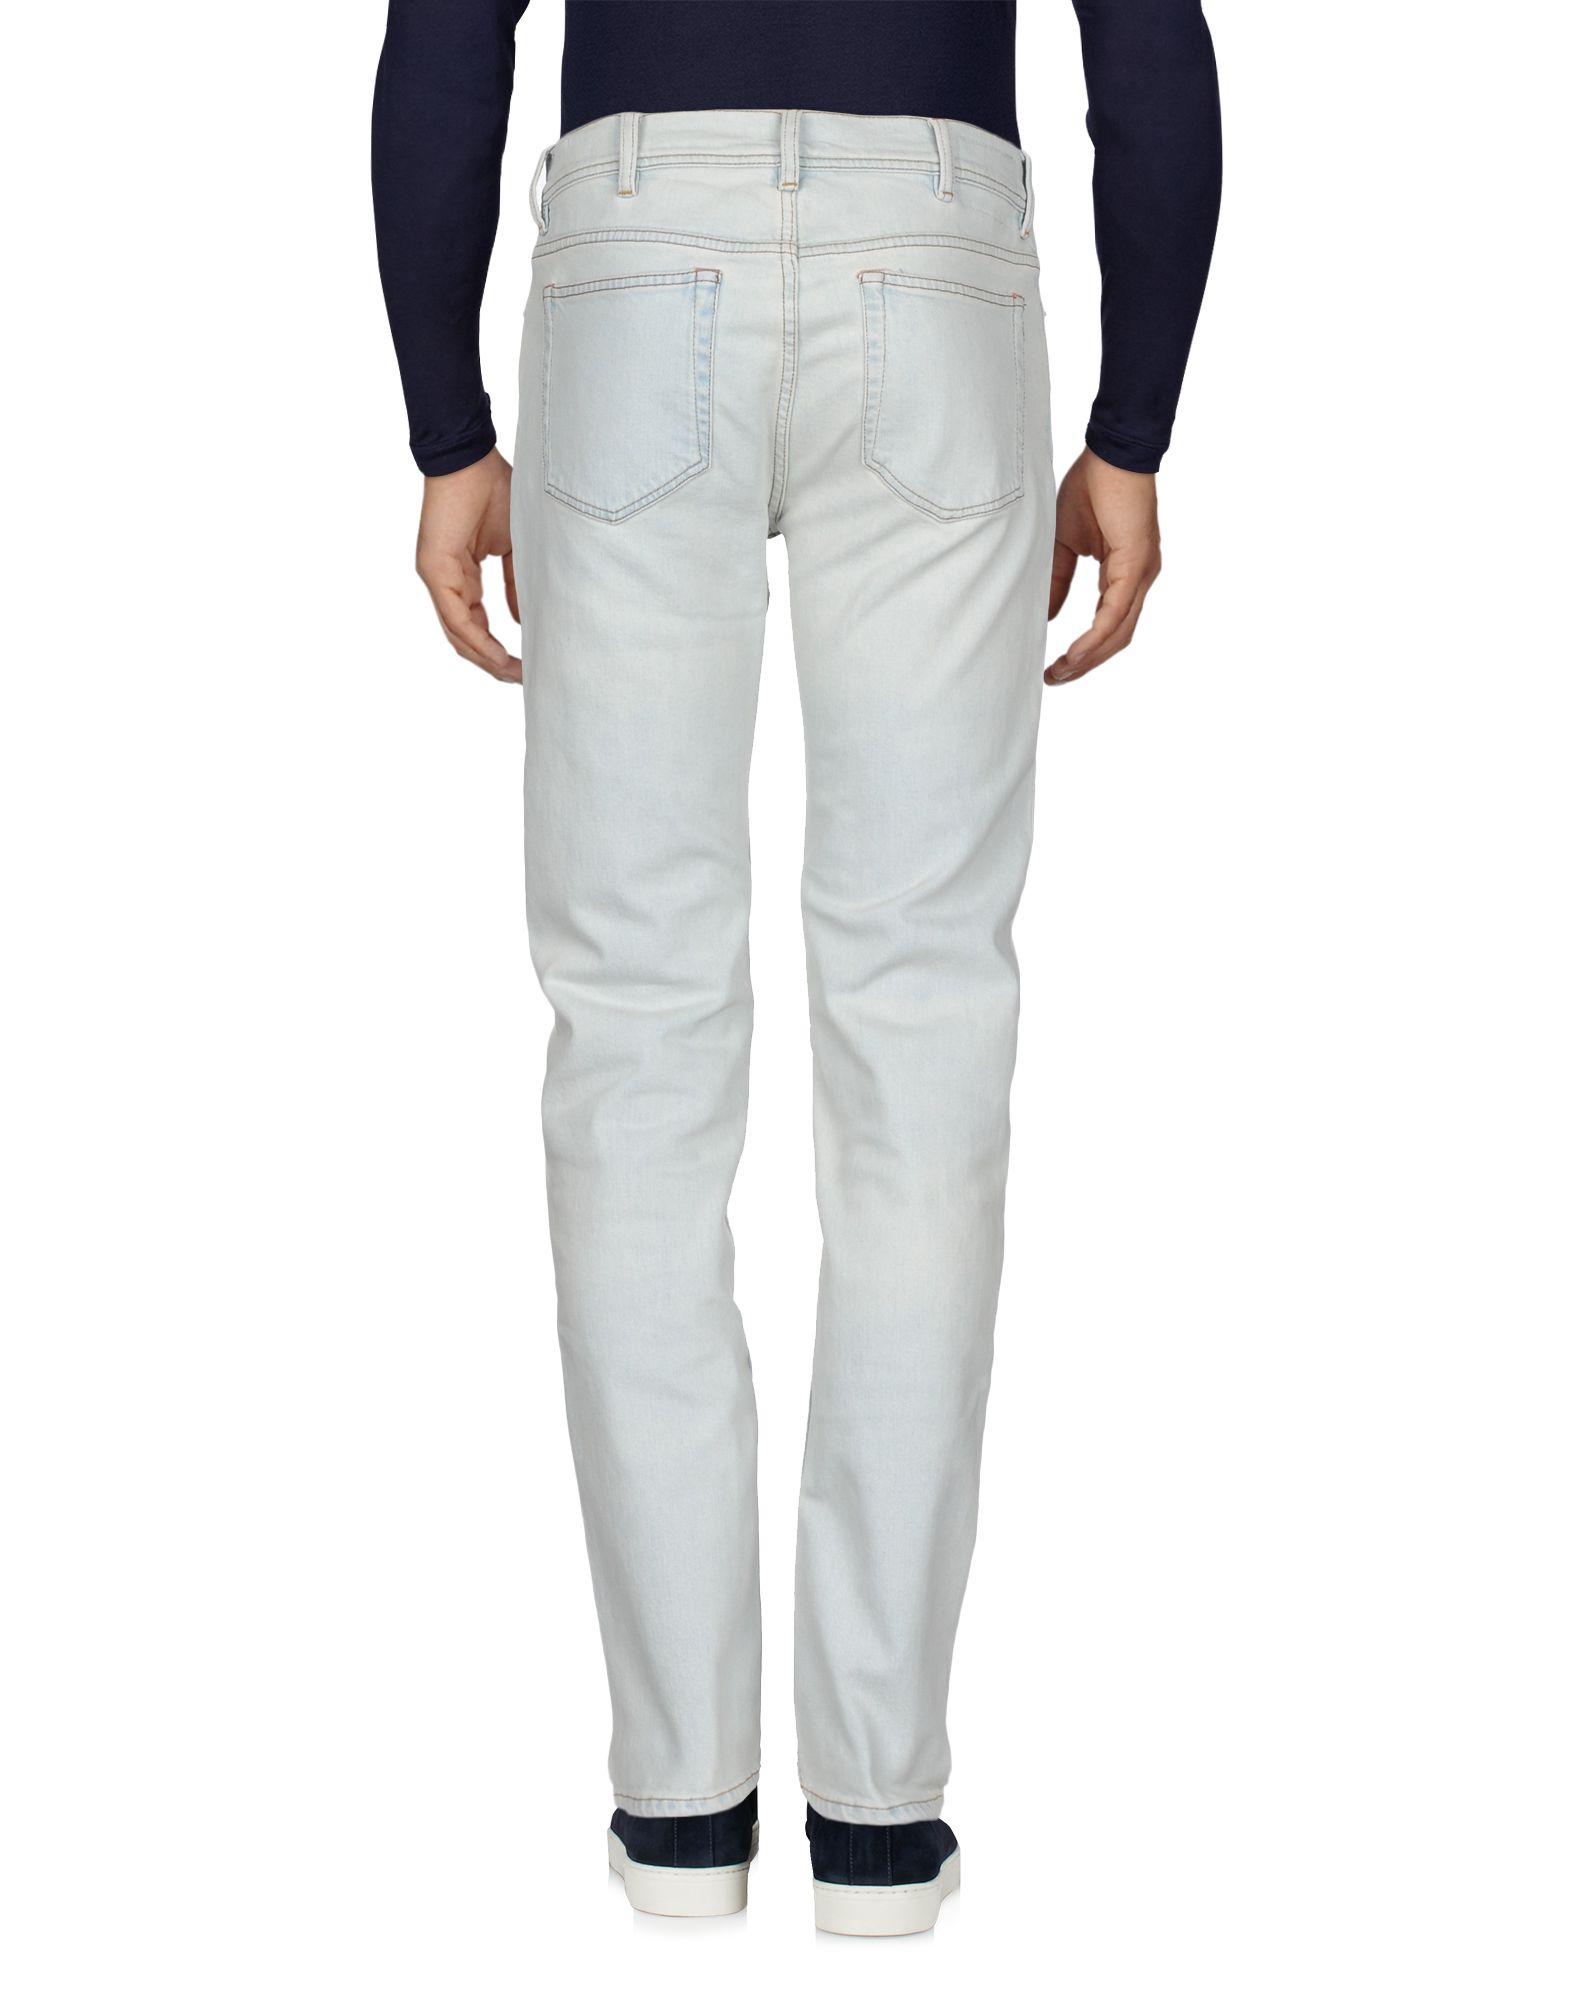 Pantaloni Jeans Acne - Studios Uomo - Acne 42678736OO ad9732